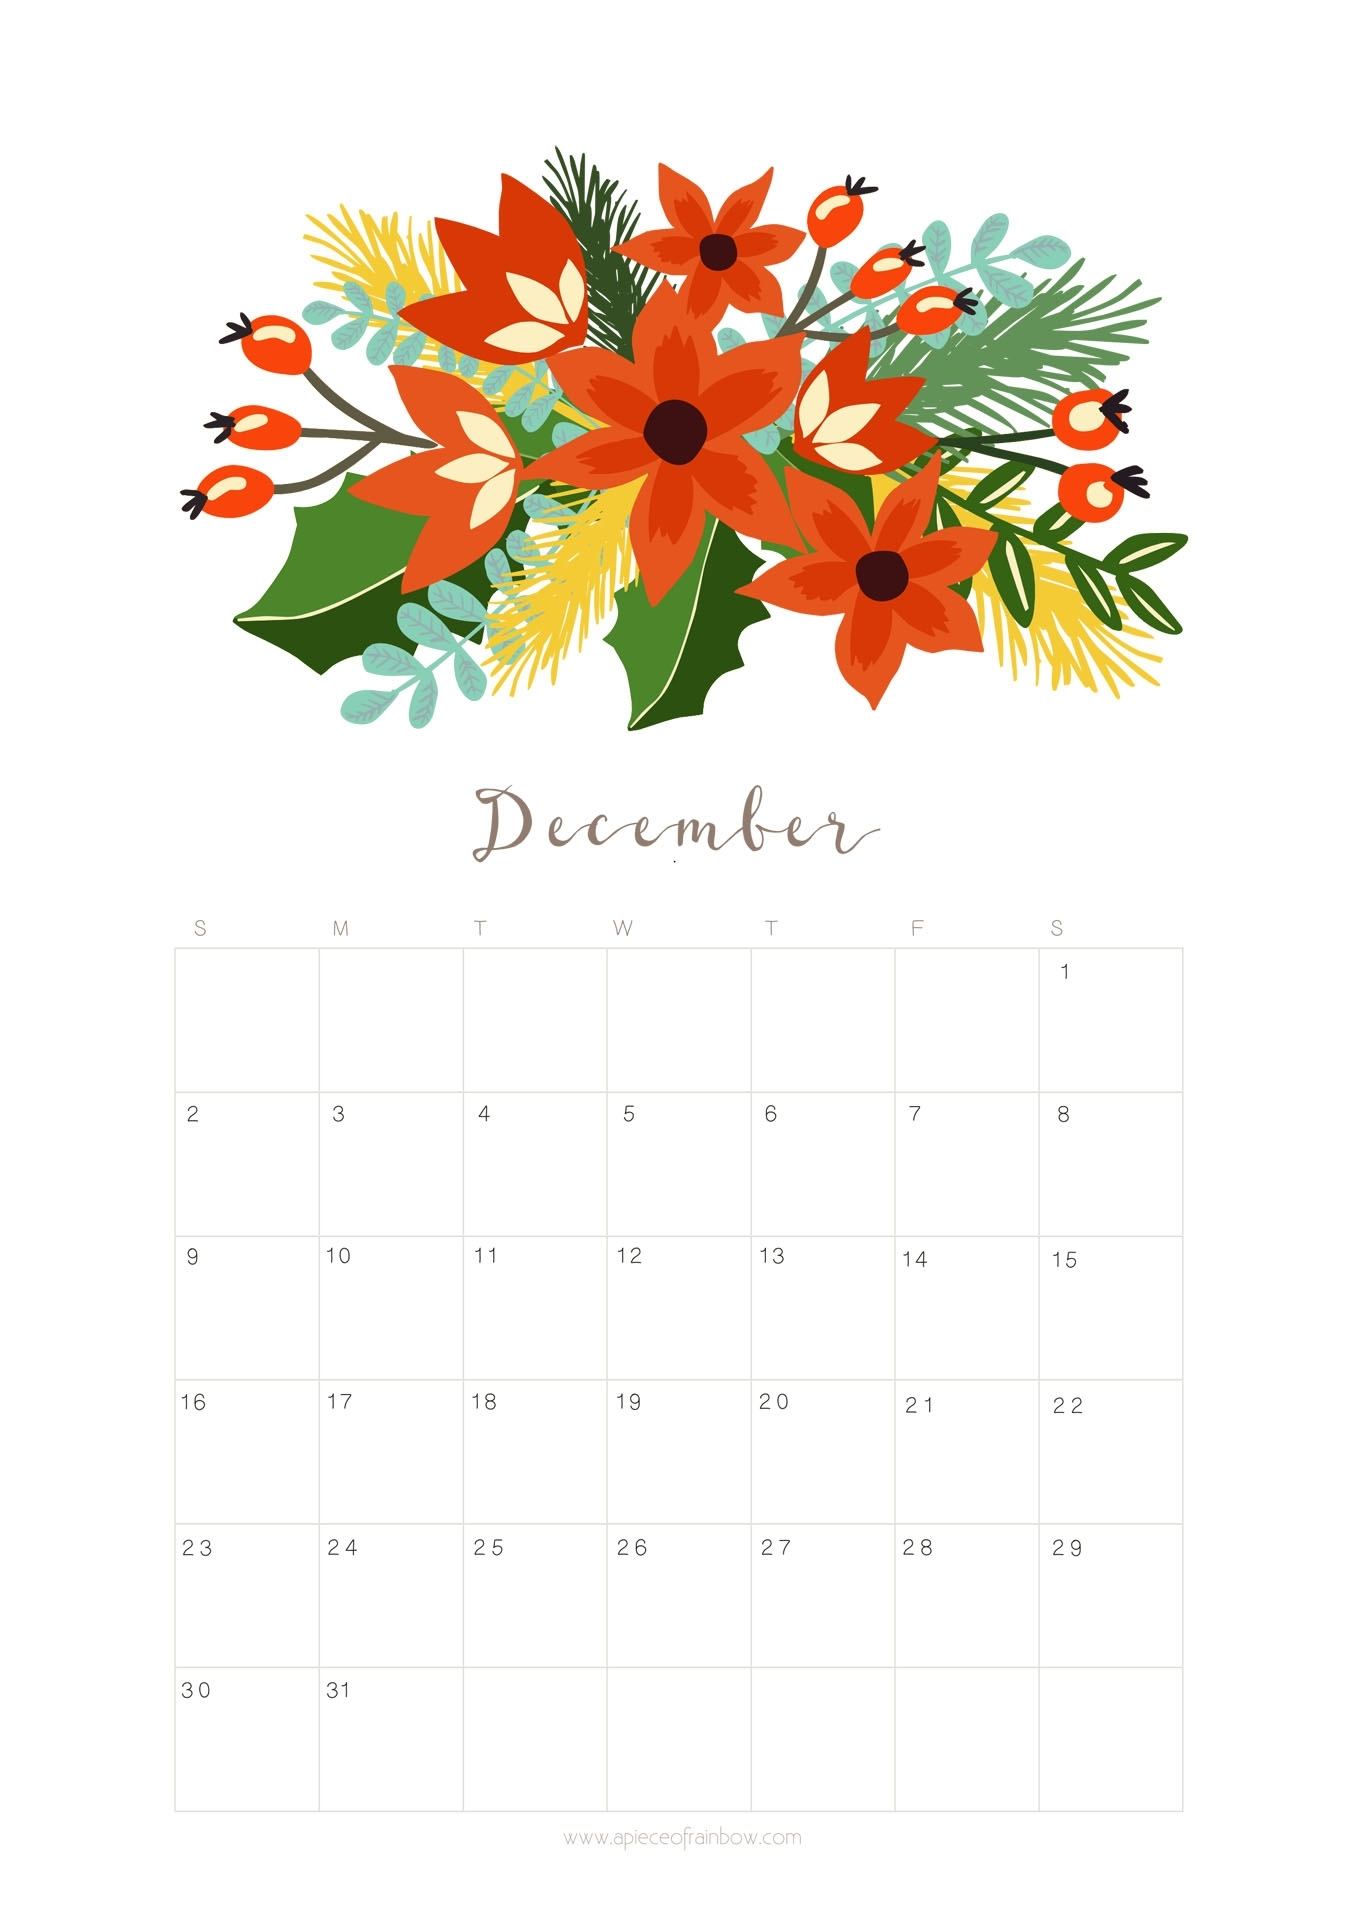 Printable December 2018 Calendar Monthly Planner - Floral